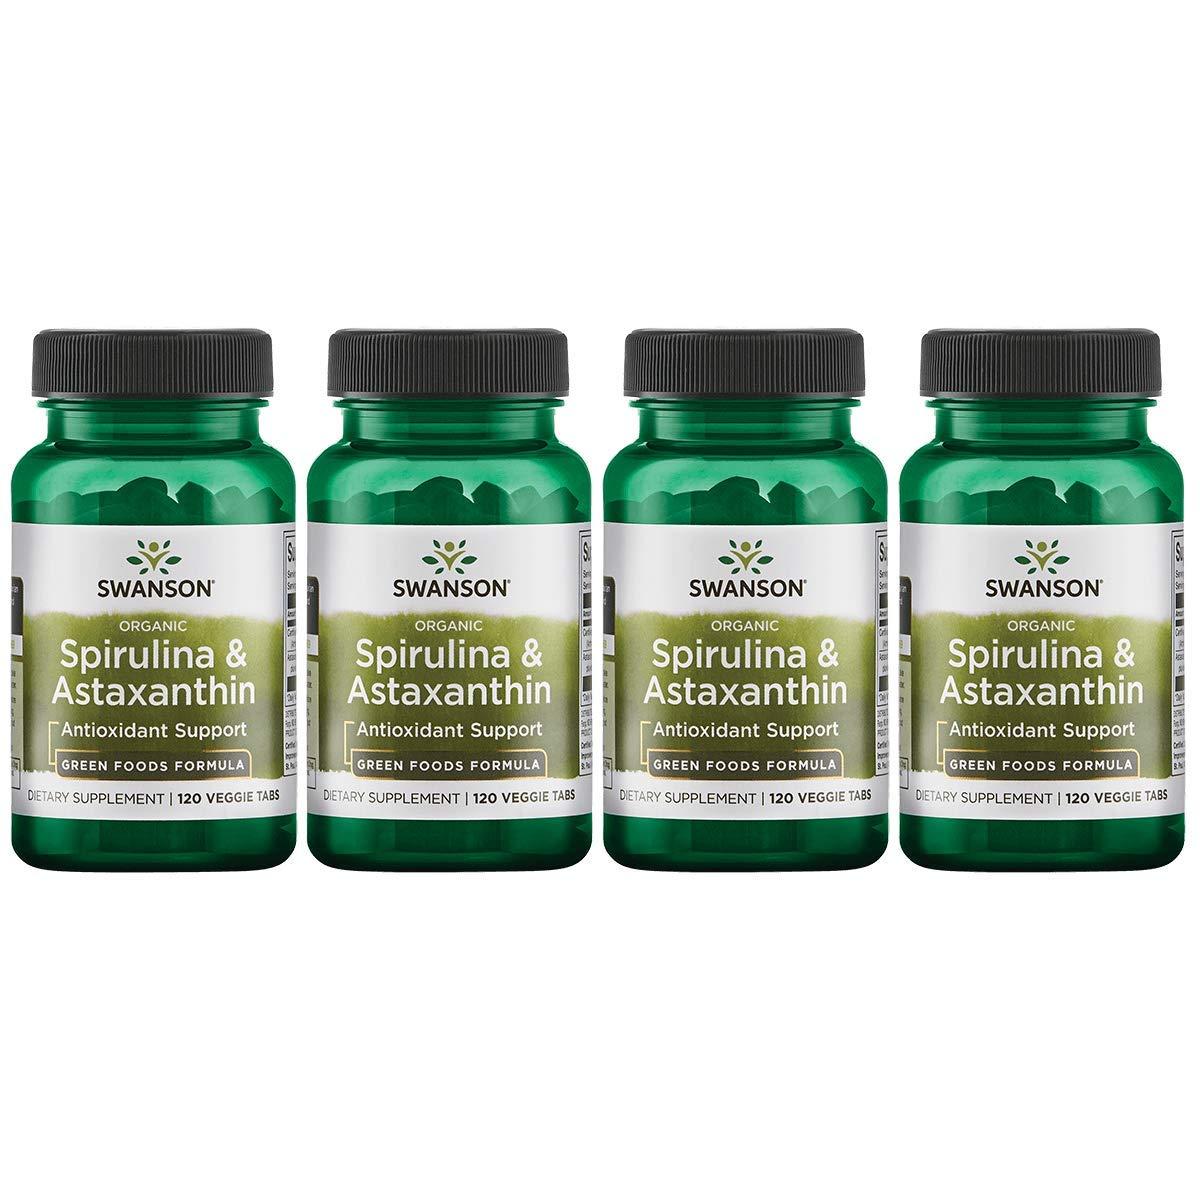 Swanson Organic Spirulina Astaxanthin 120 Veg Tabs 4 Pack